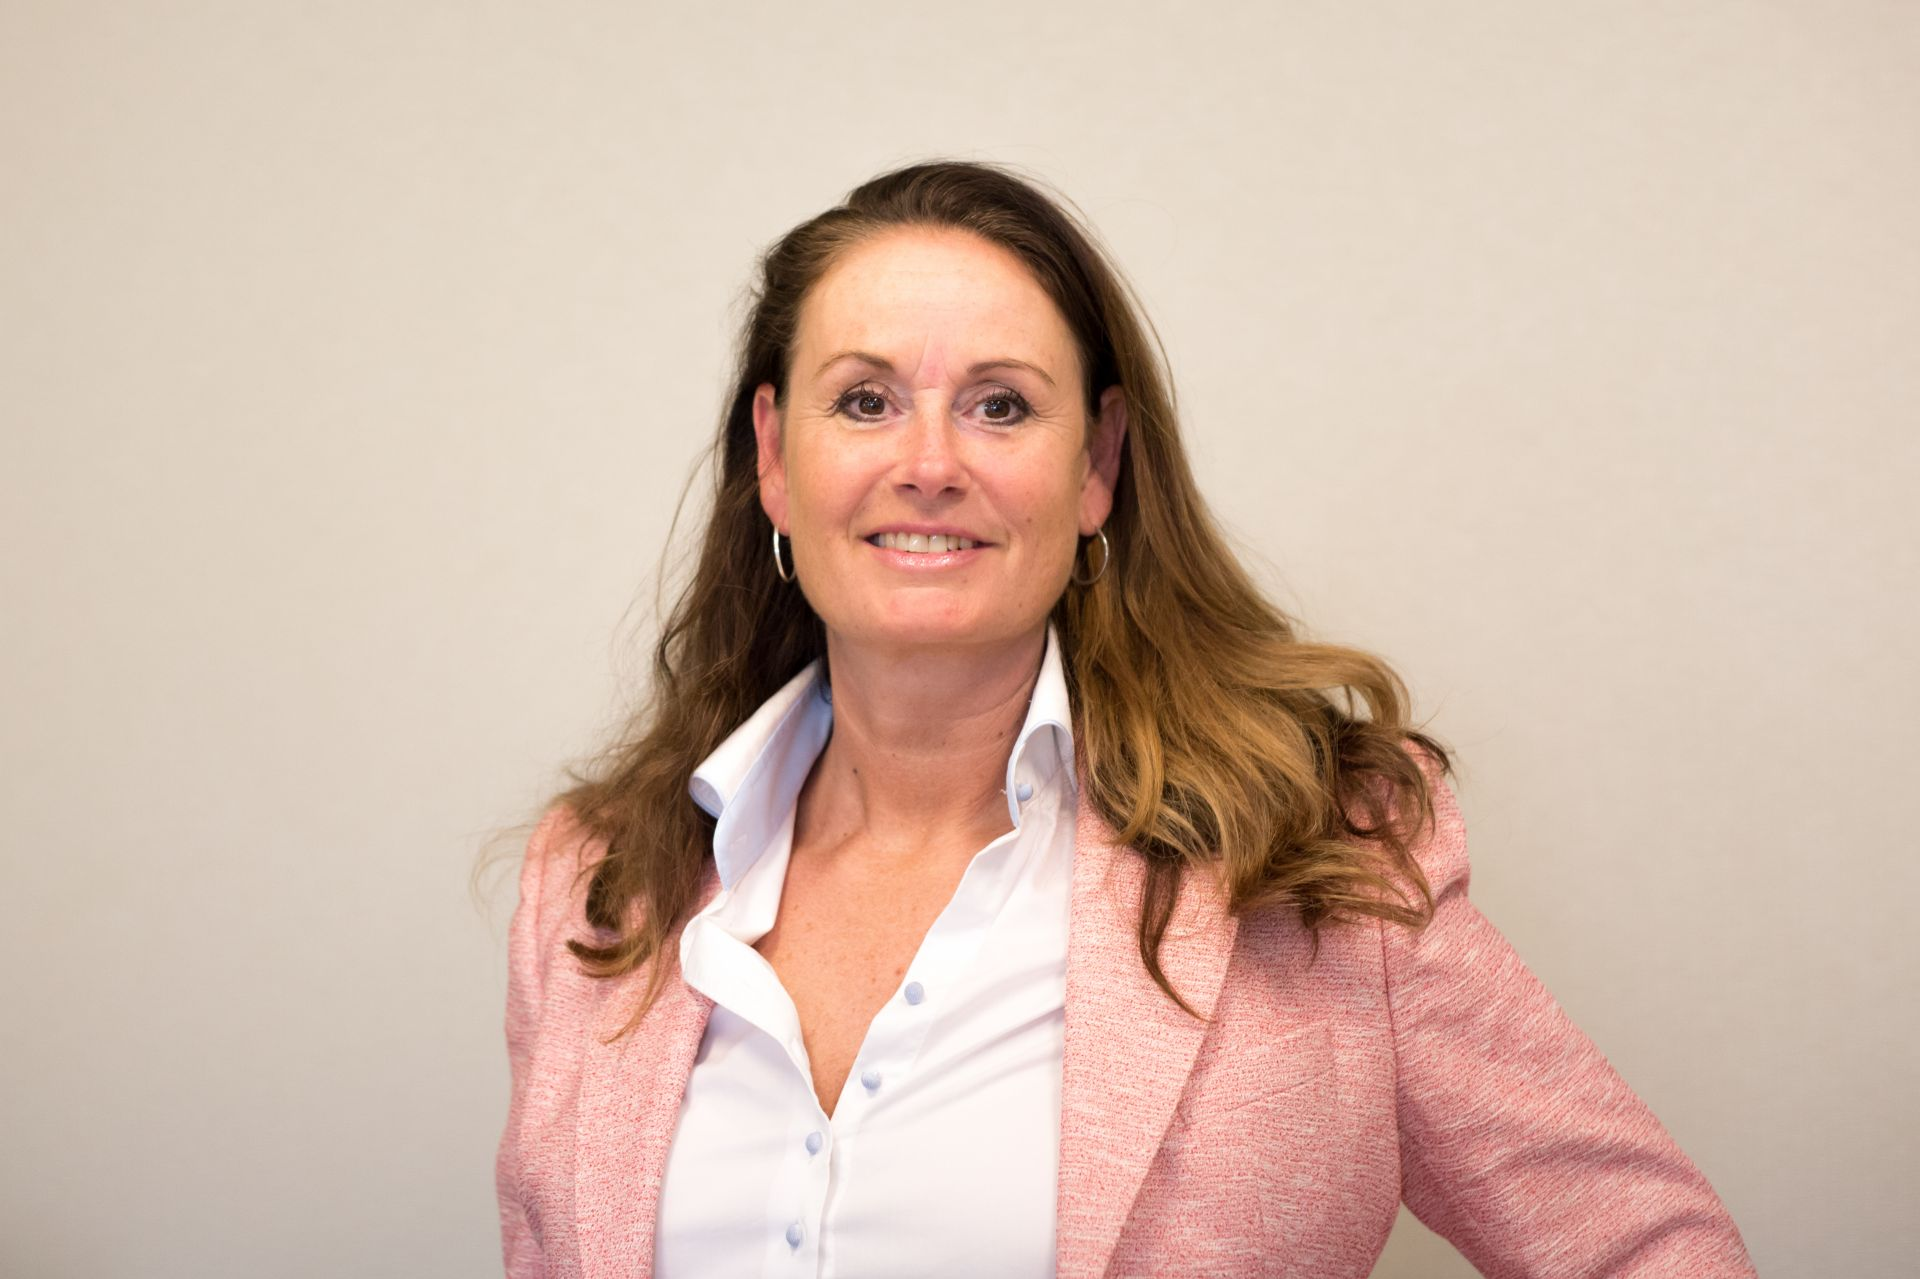 Nicolle Haverkort